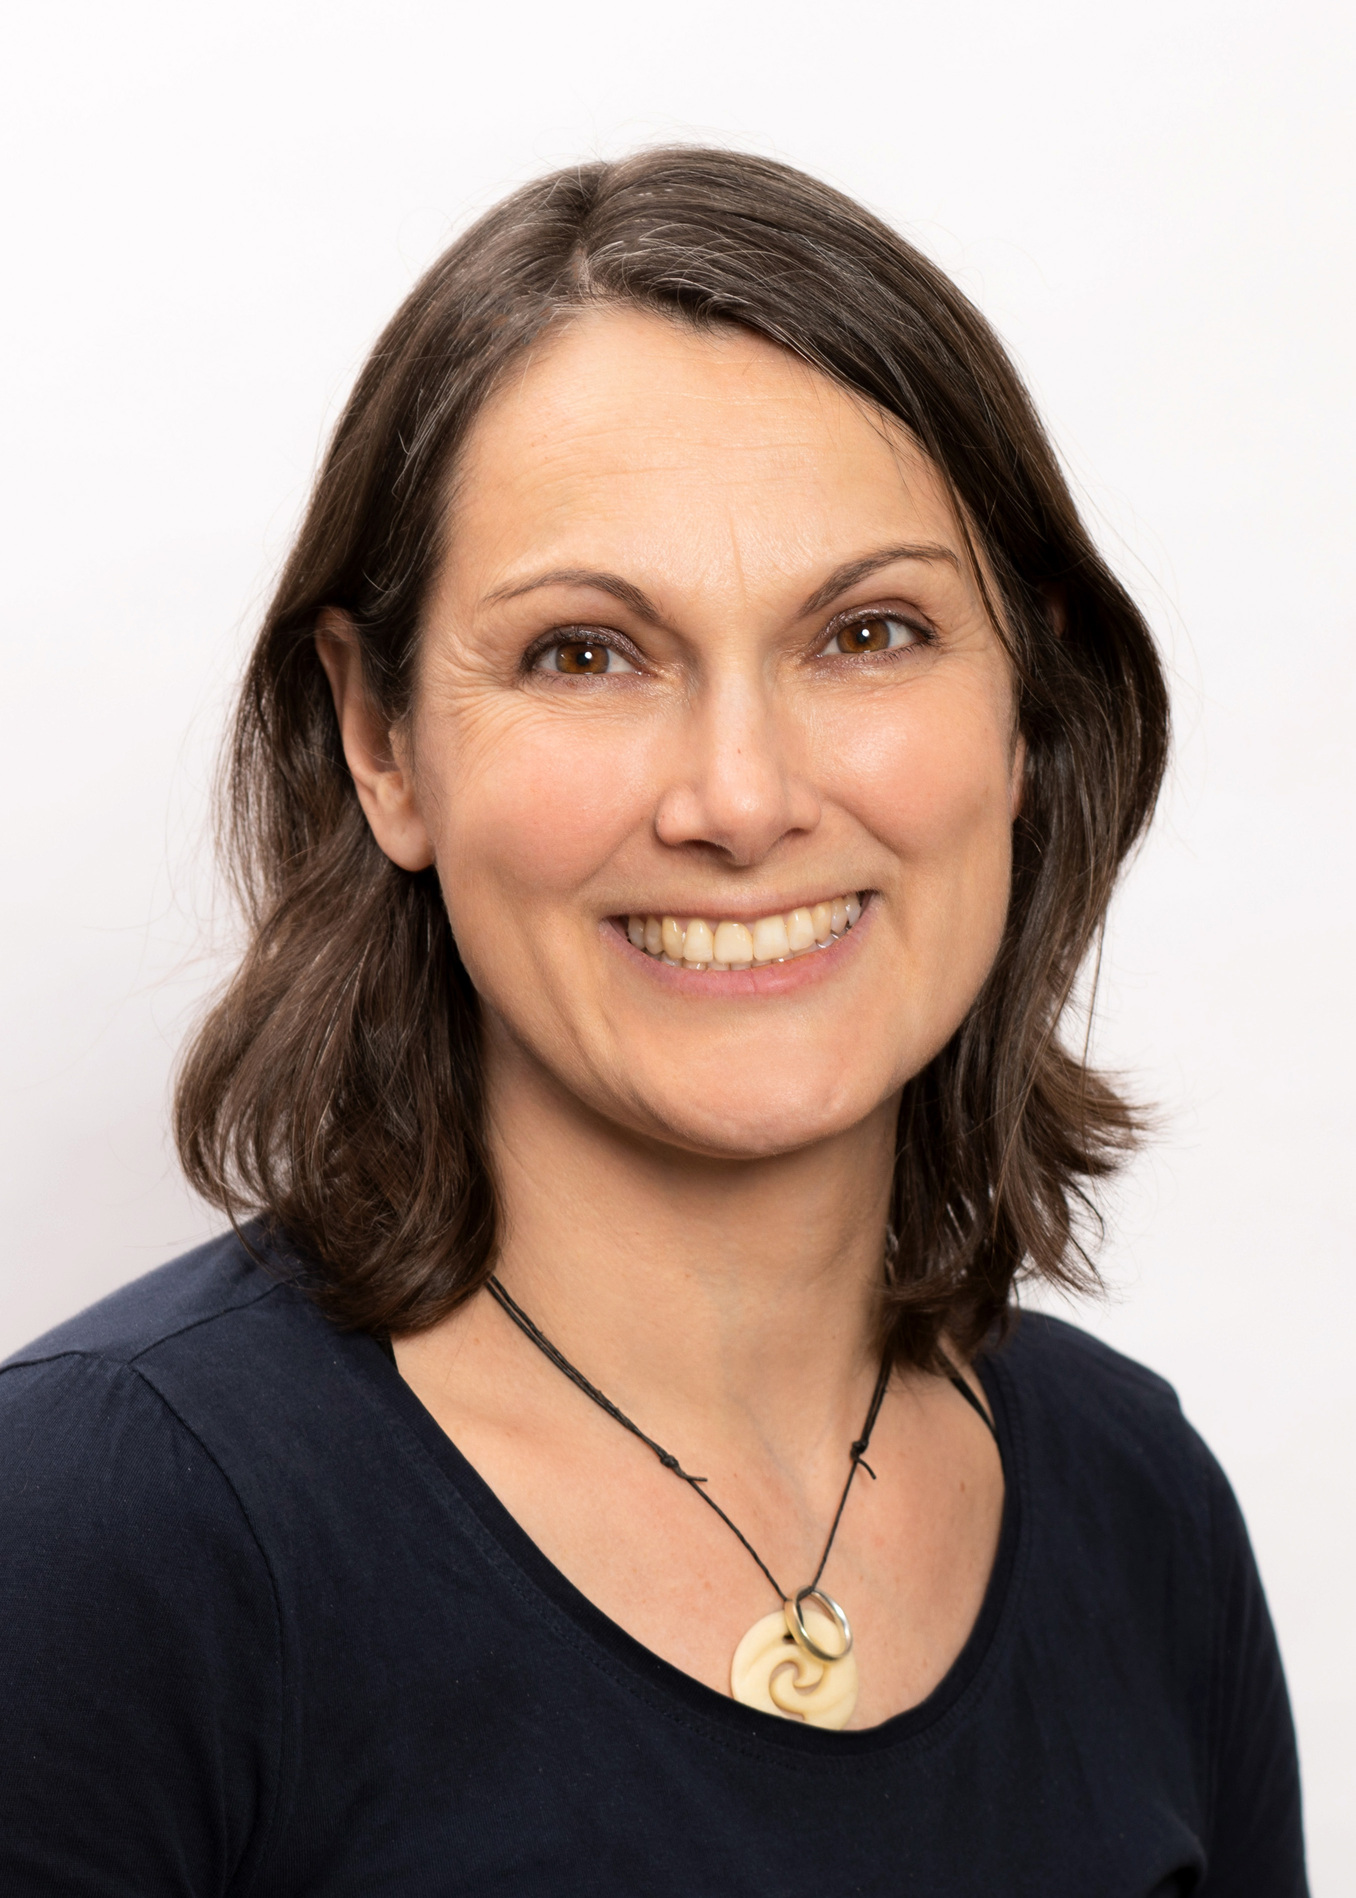 Birgit Alef